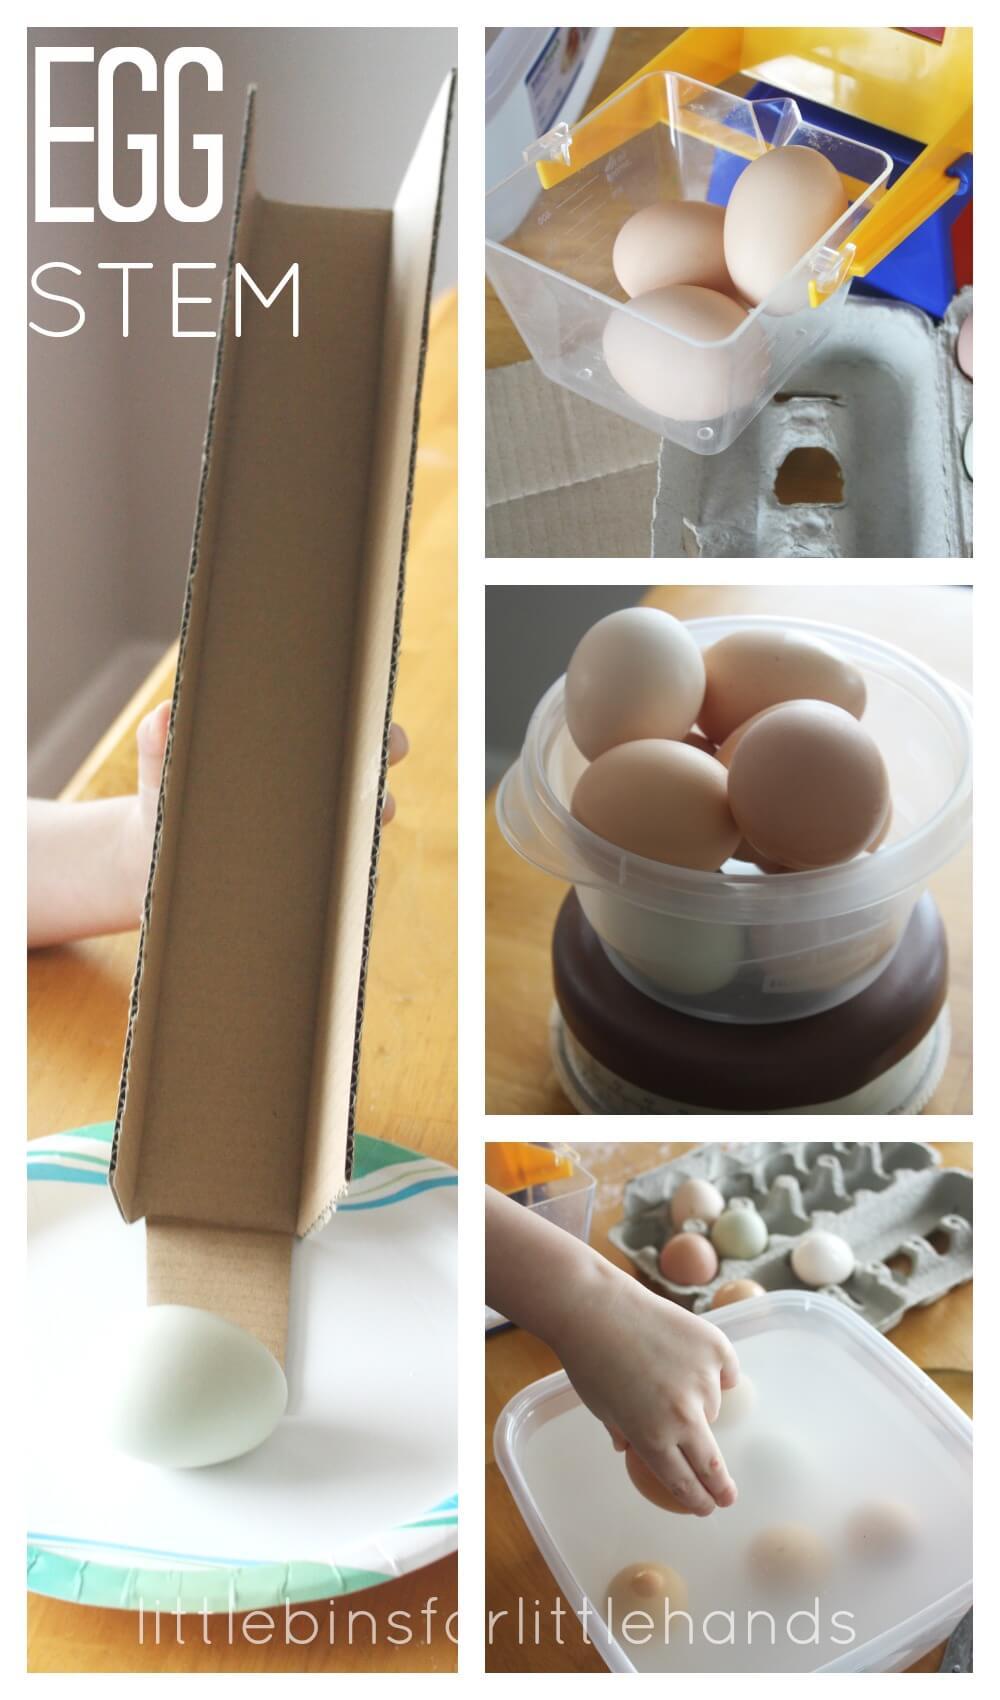 Egg Stem Real Egg Science Activities For Kids